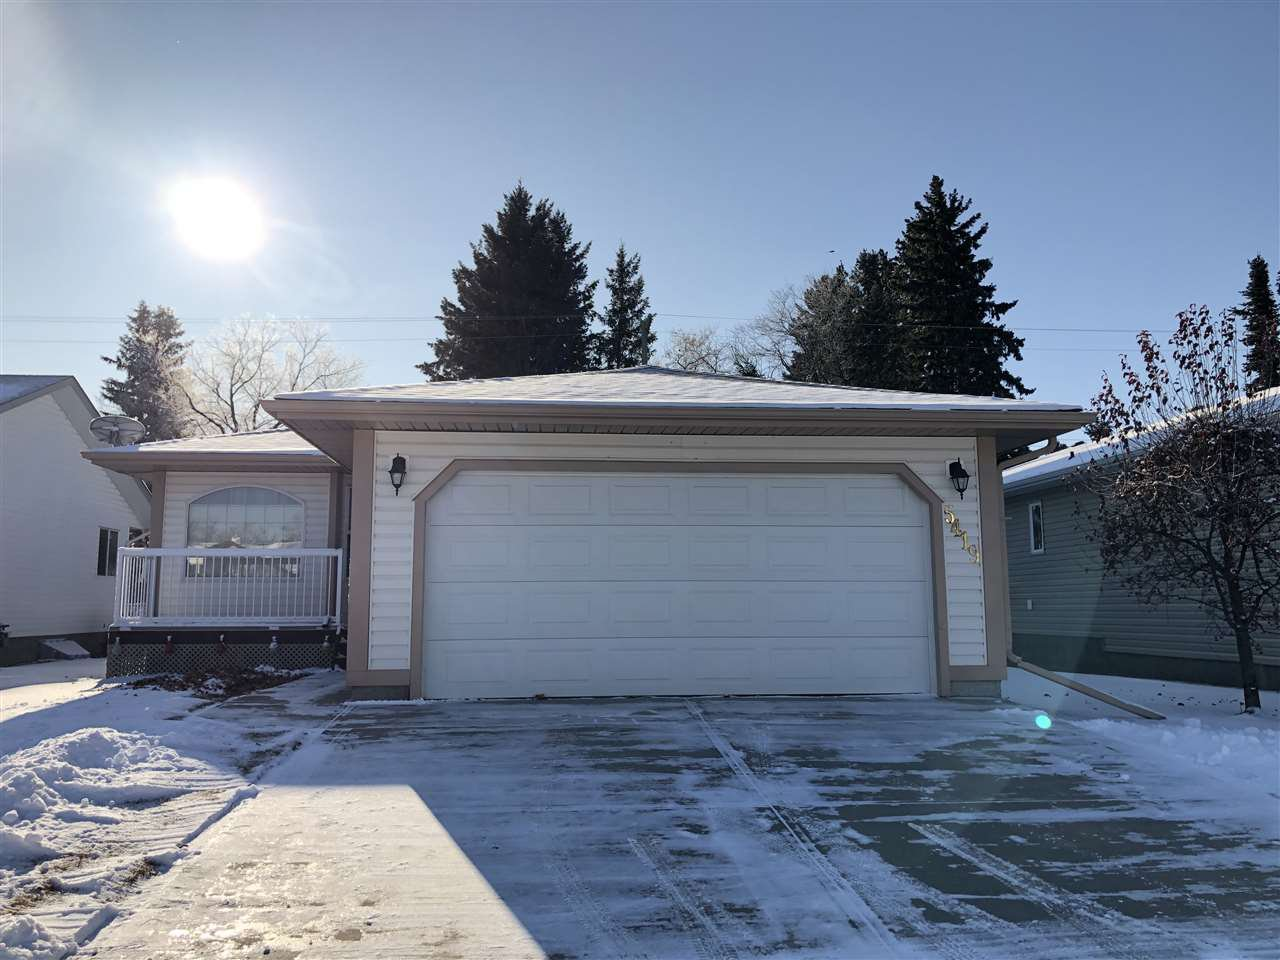 Main Photo: 5419 47 Avenue: Wetaskiwin House for sale : MLS®# E4165336